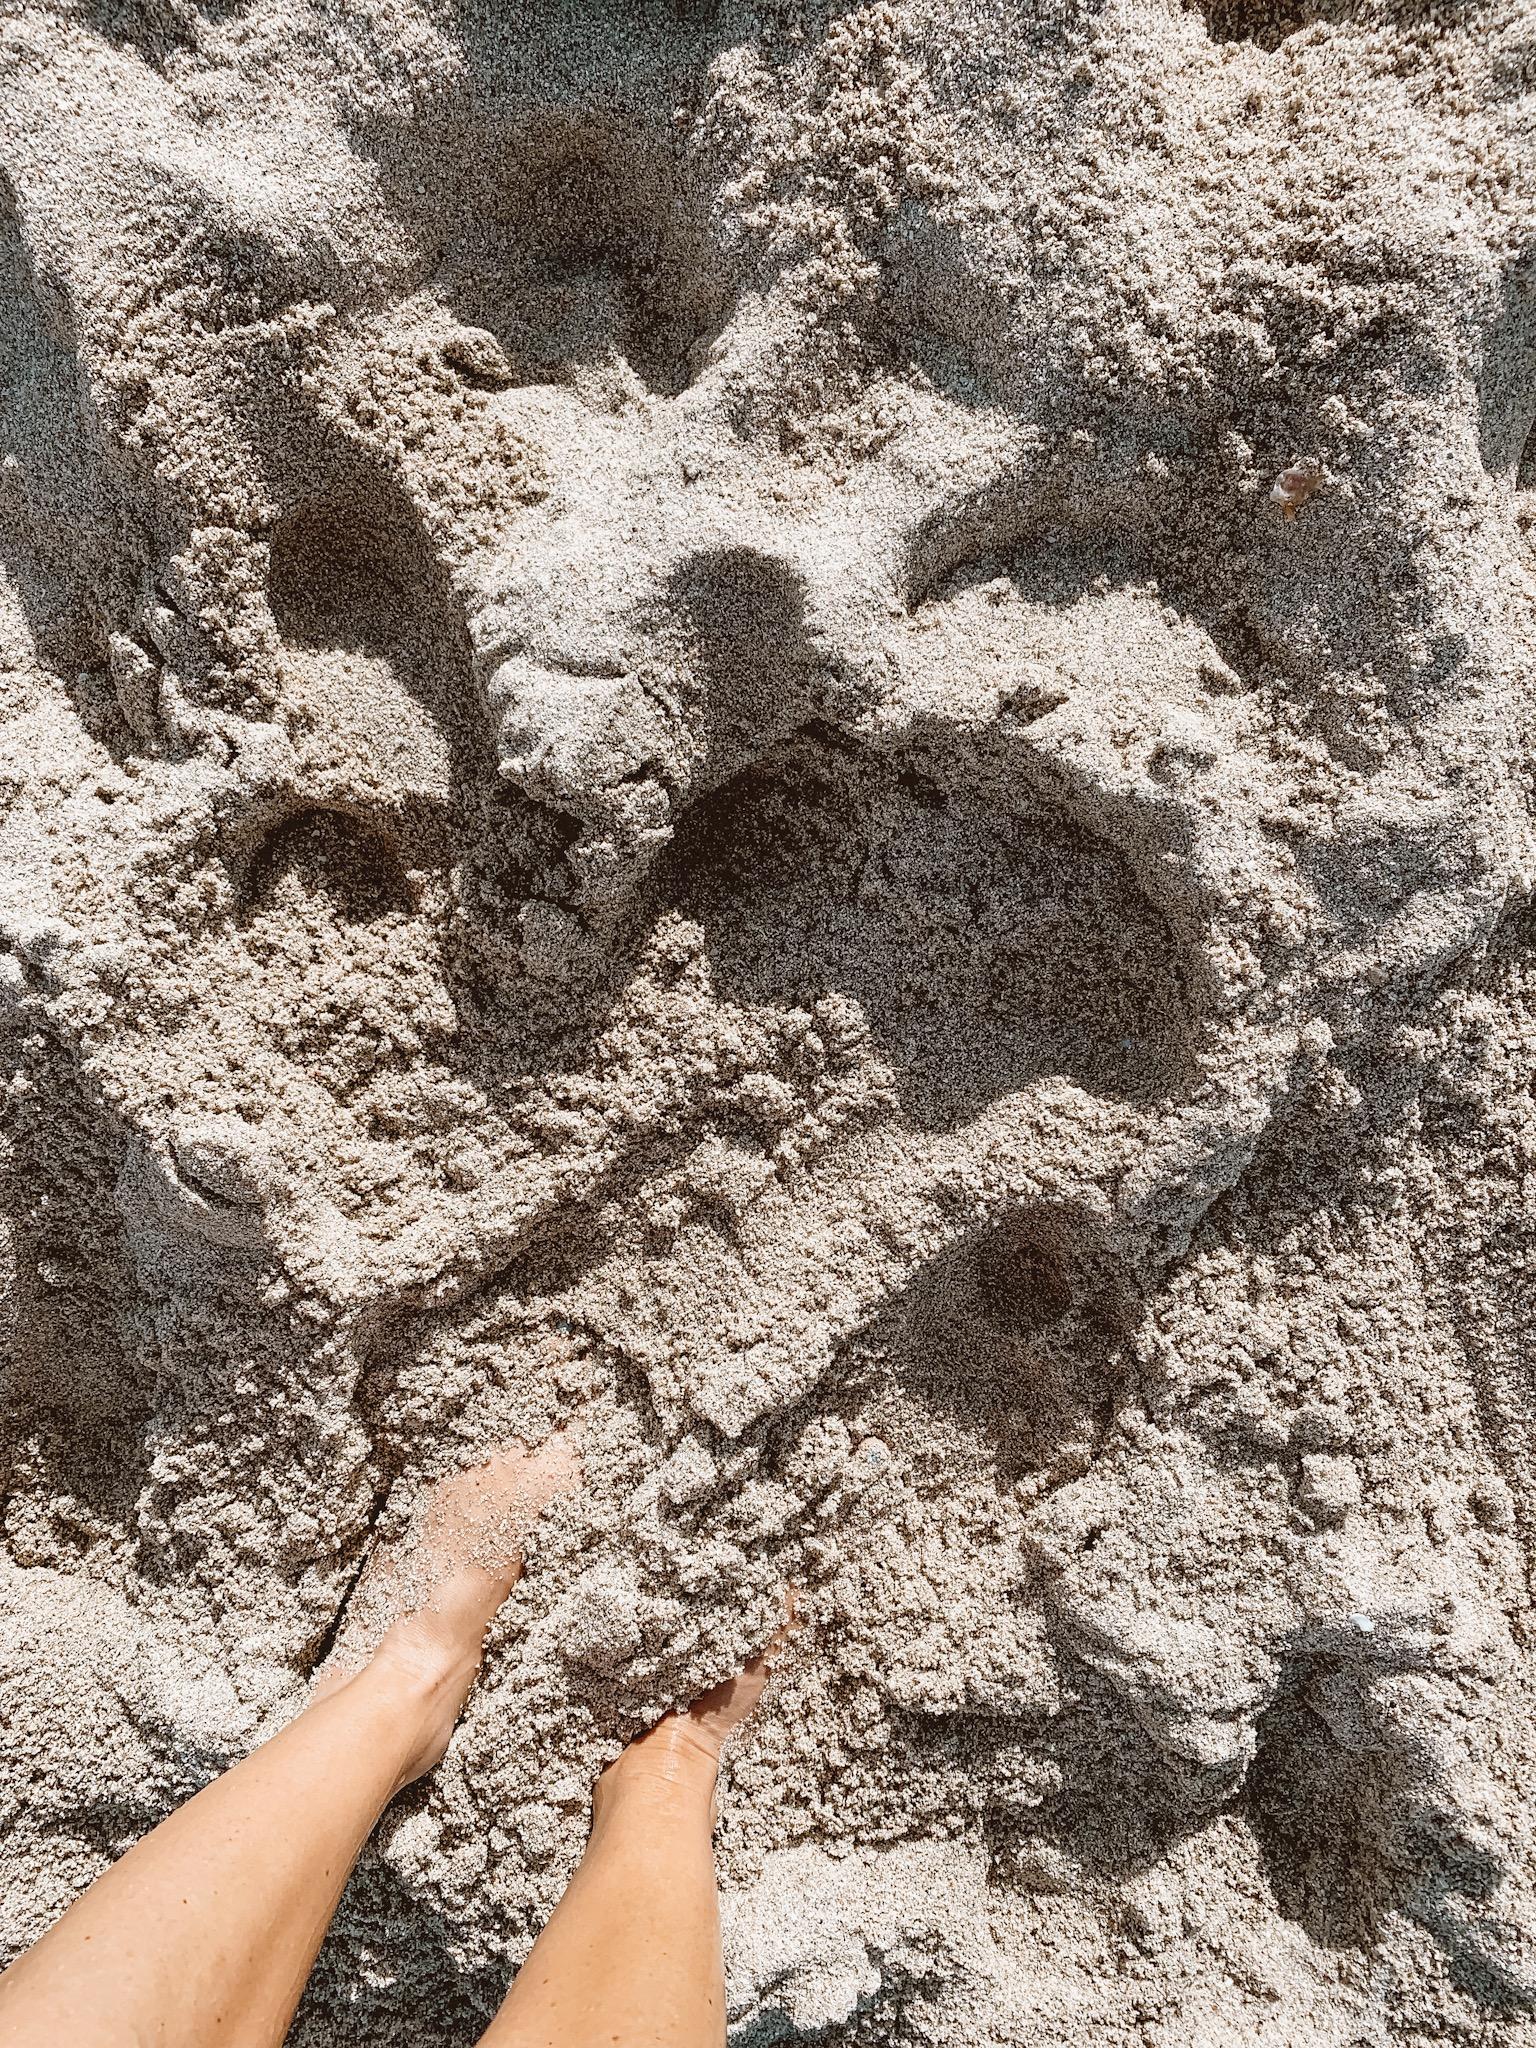 South Beach Miami Sand